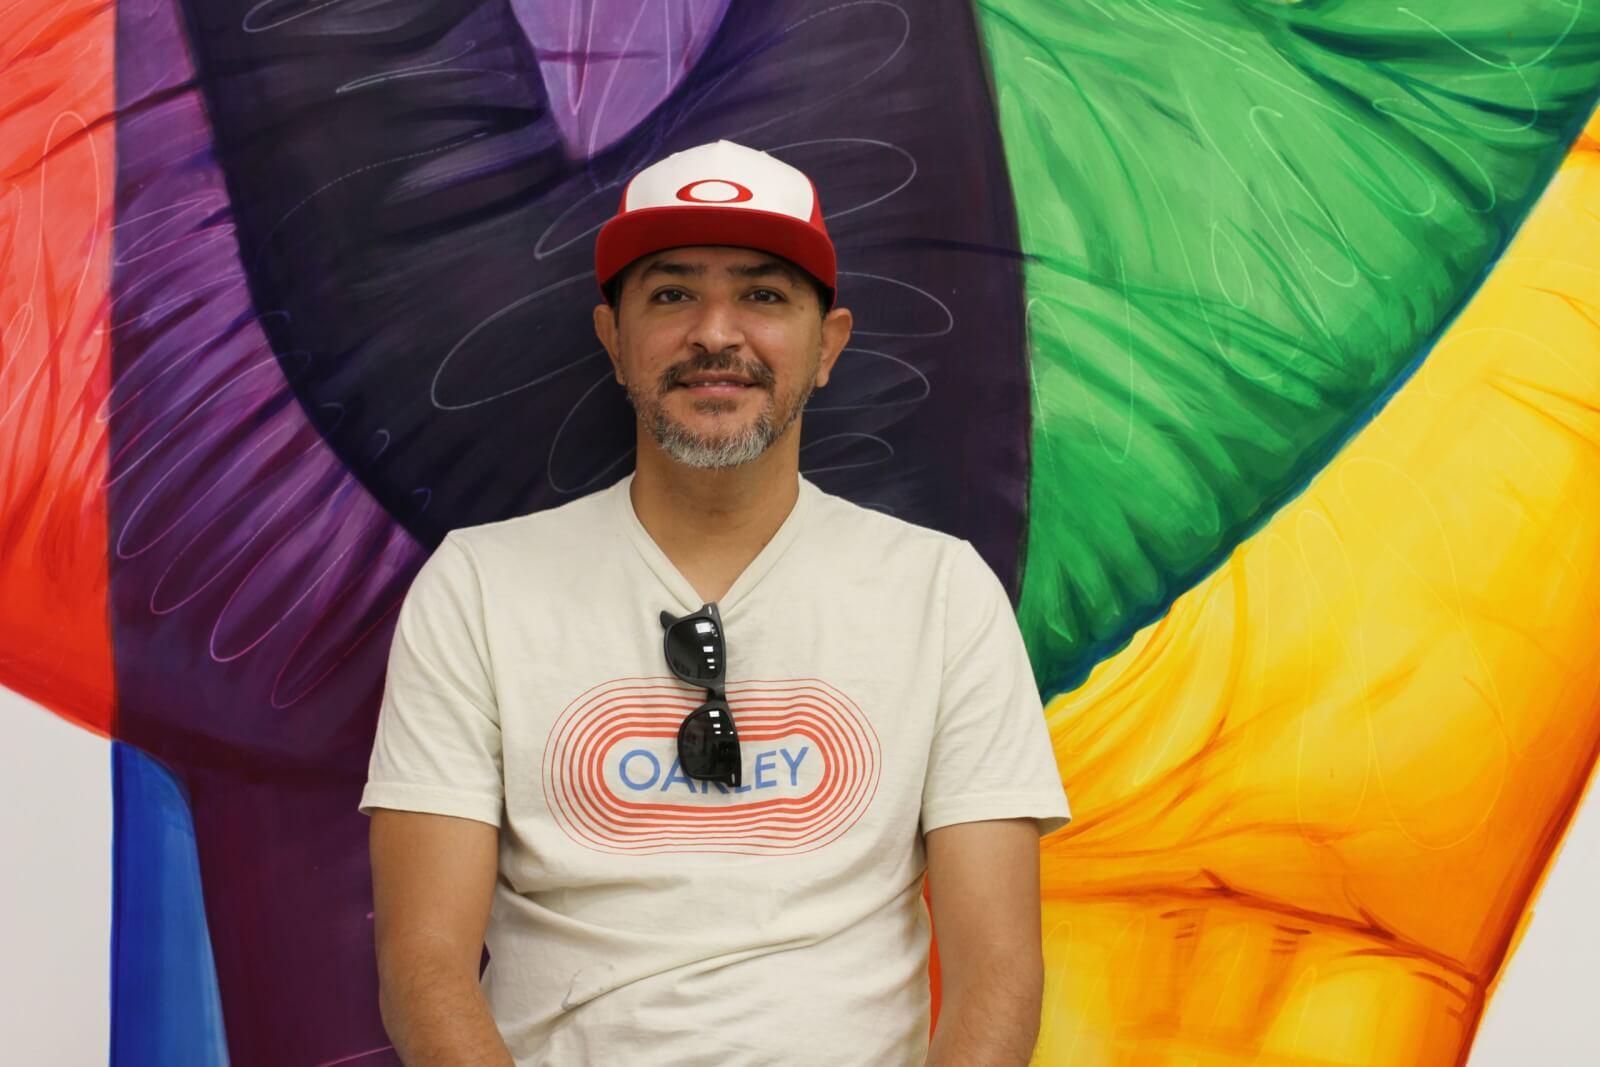 Muralist Ignacio Garcia smiles in front of a colorful mural